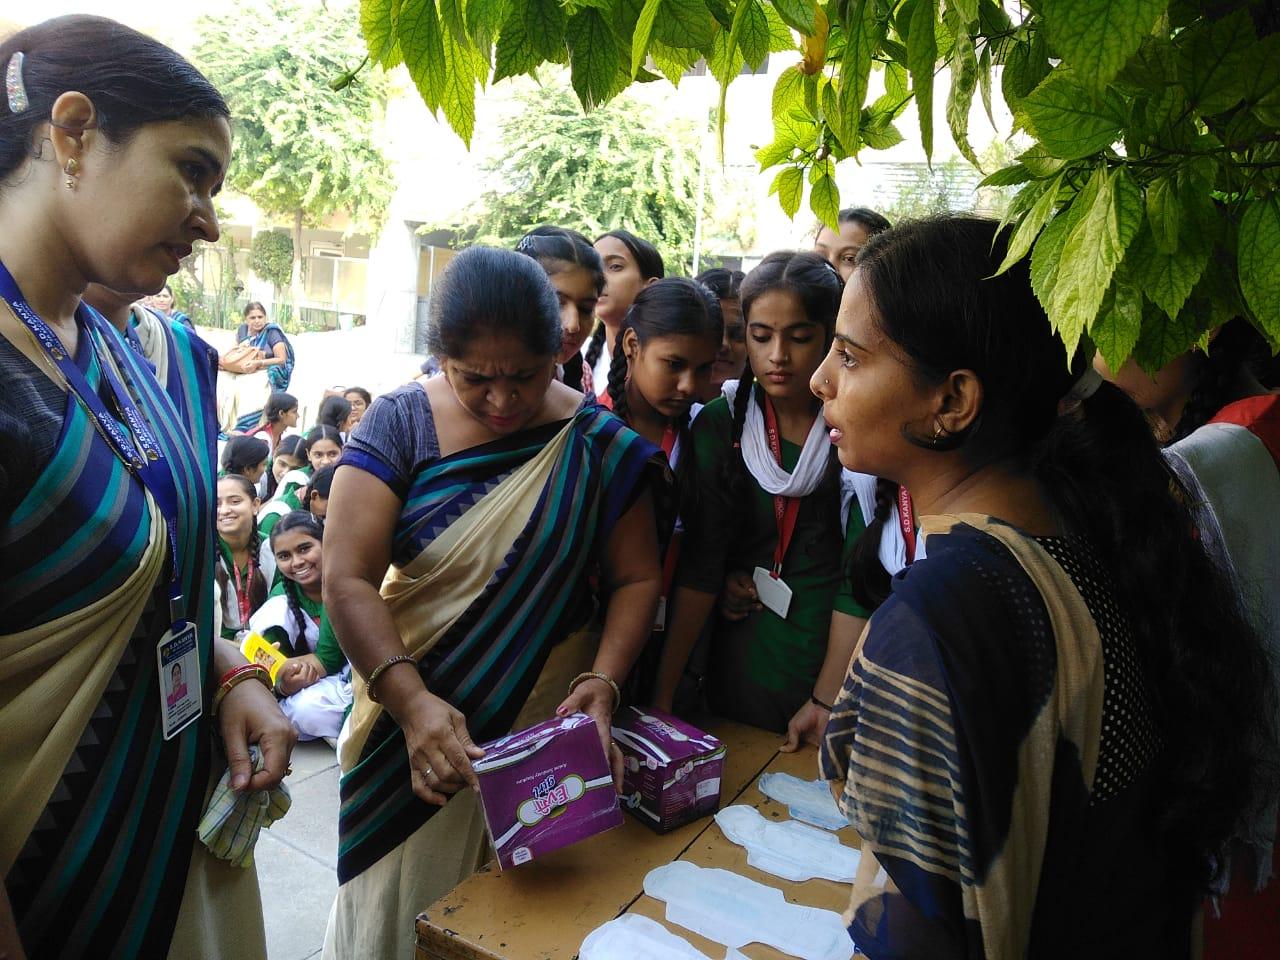 Every Girl Full Business in Hindi-English Megnatic Anion